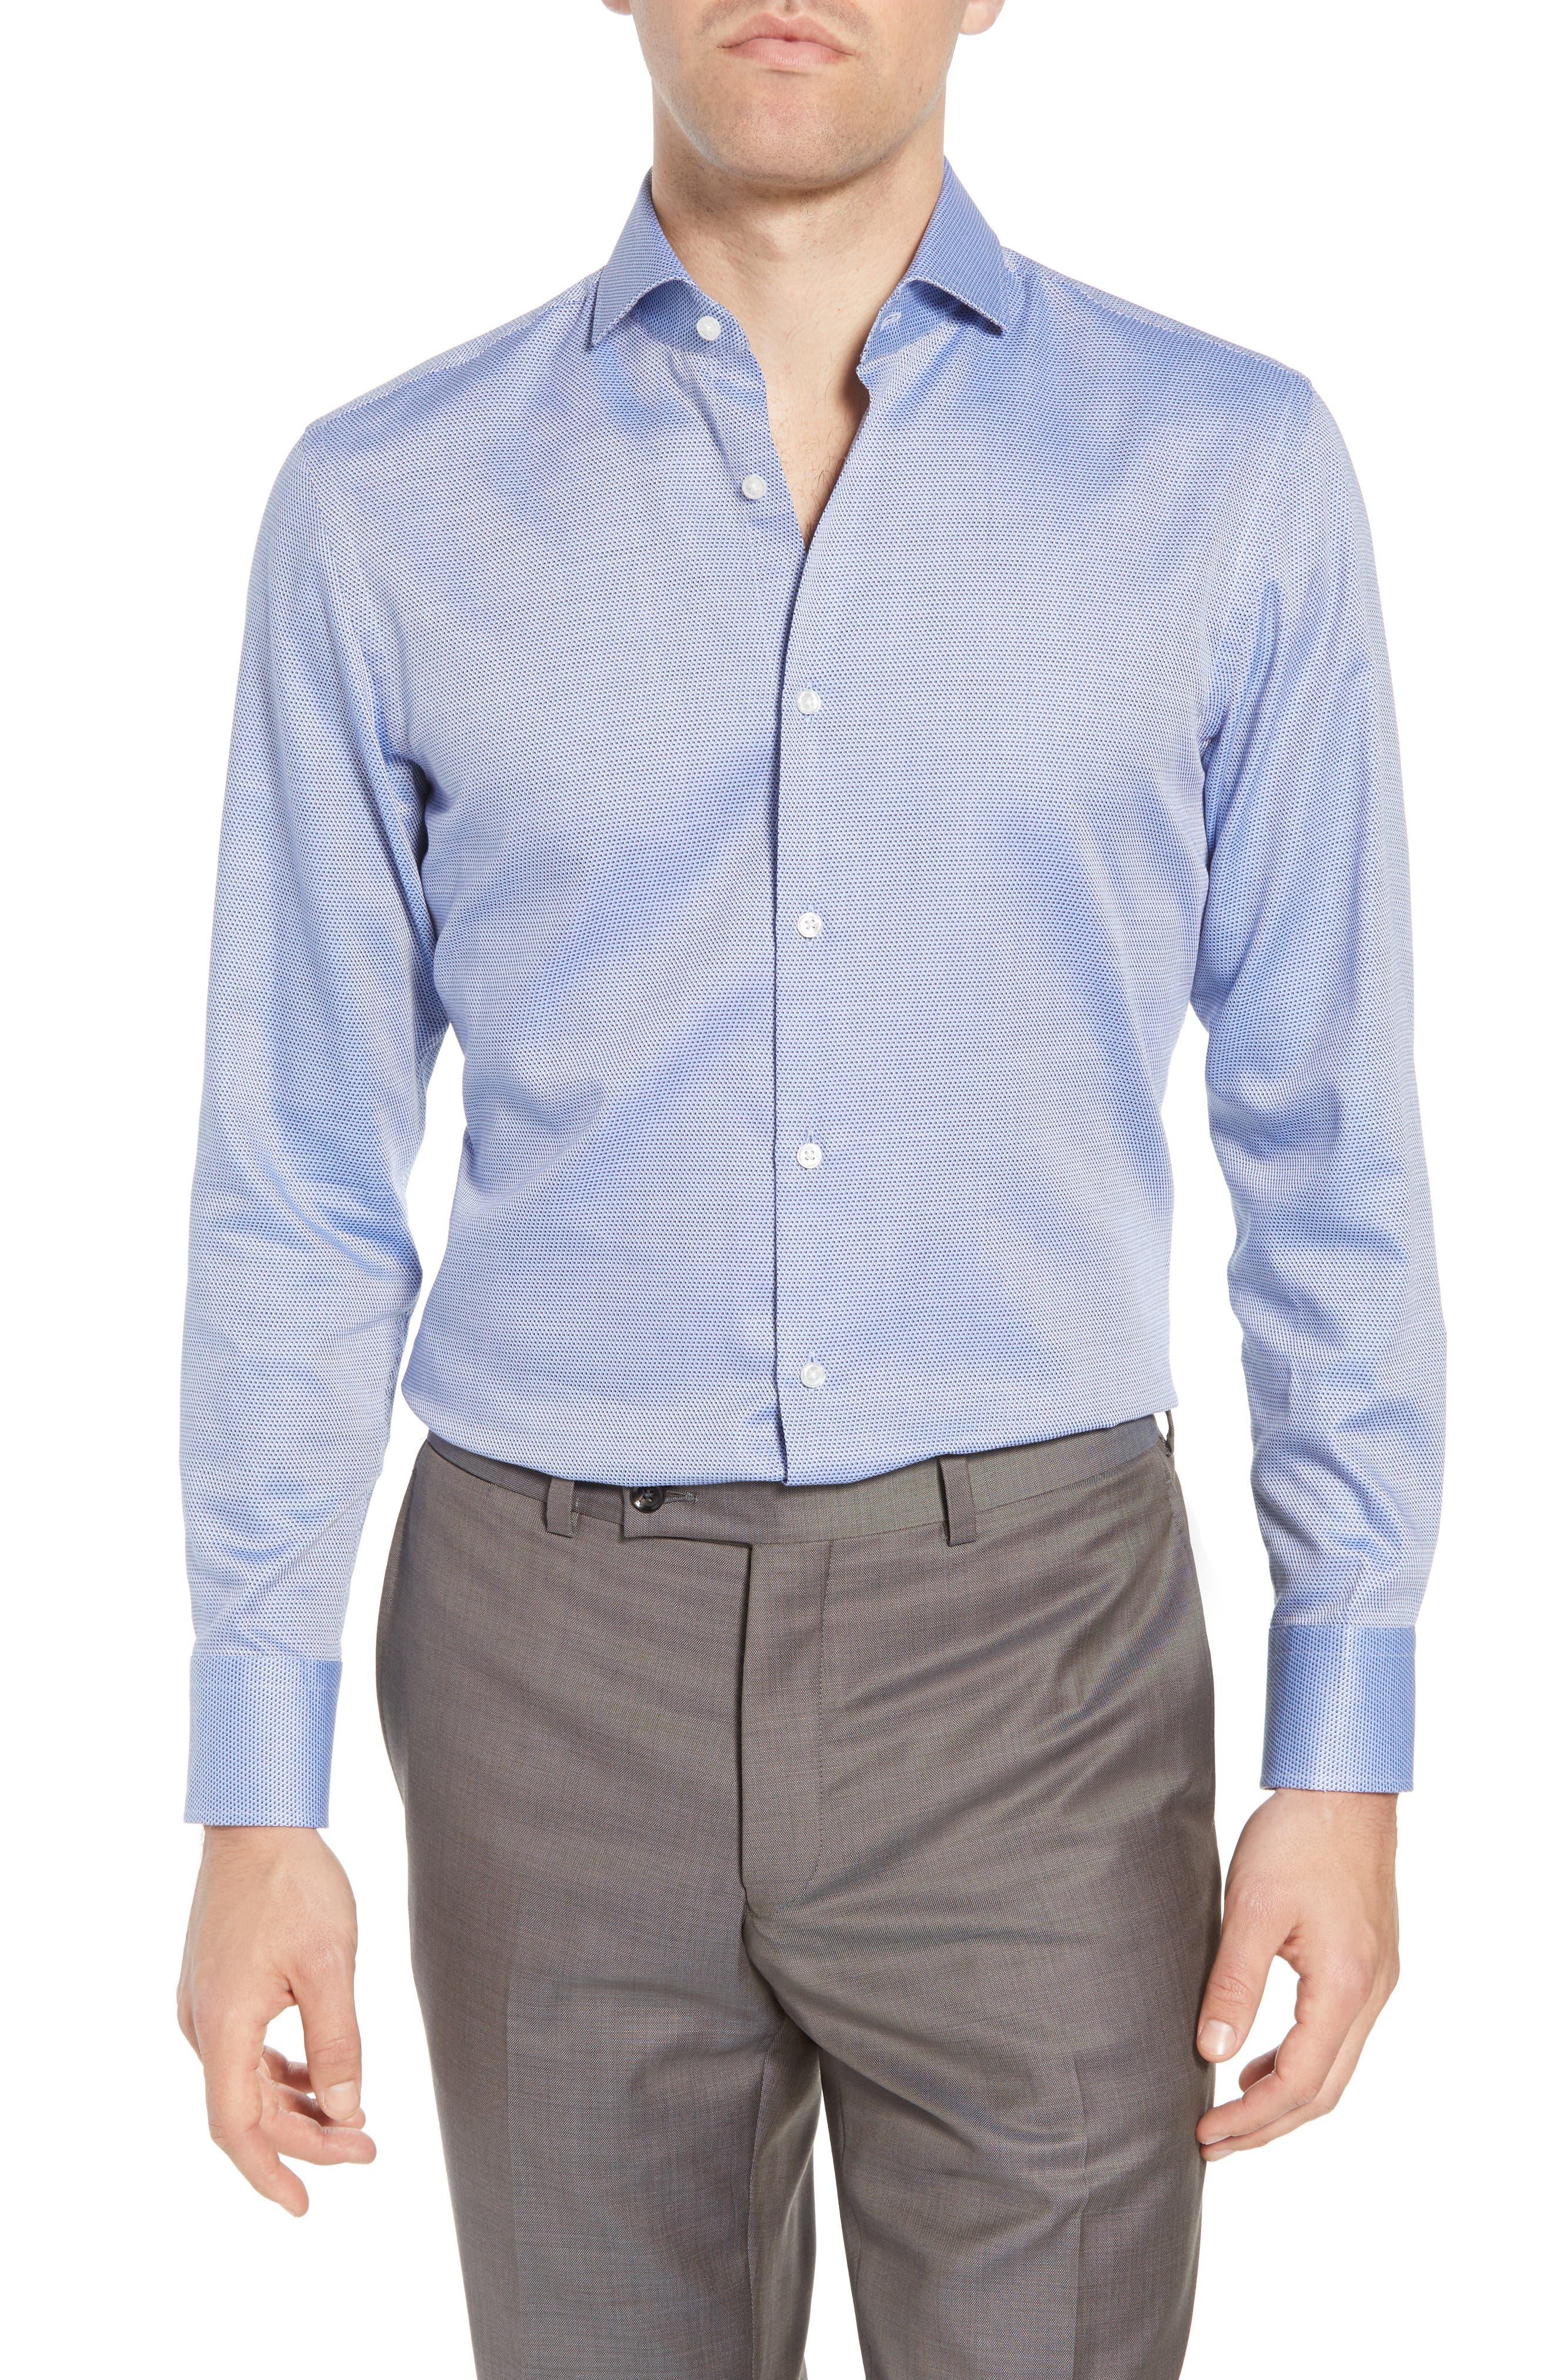 Sharp Fit Dress Shirt,                             Main thumbnail 1, color,                             Blue